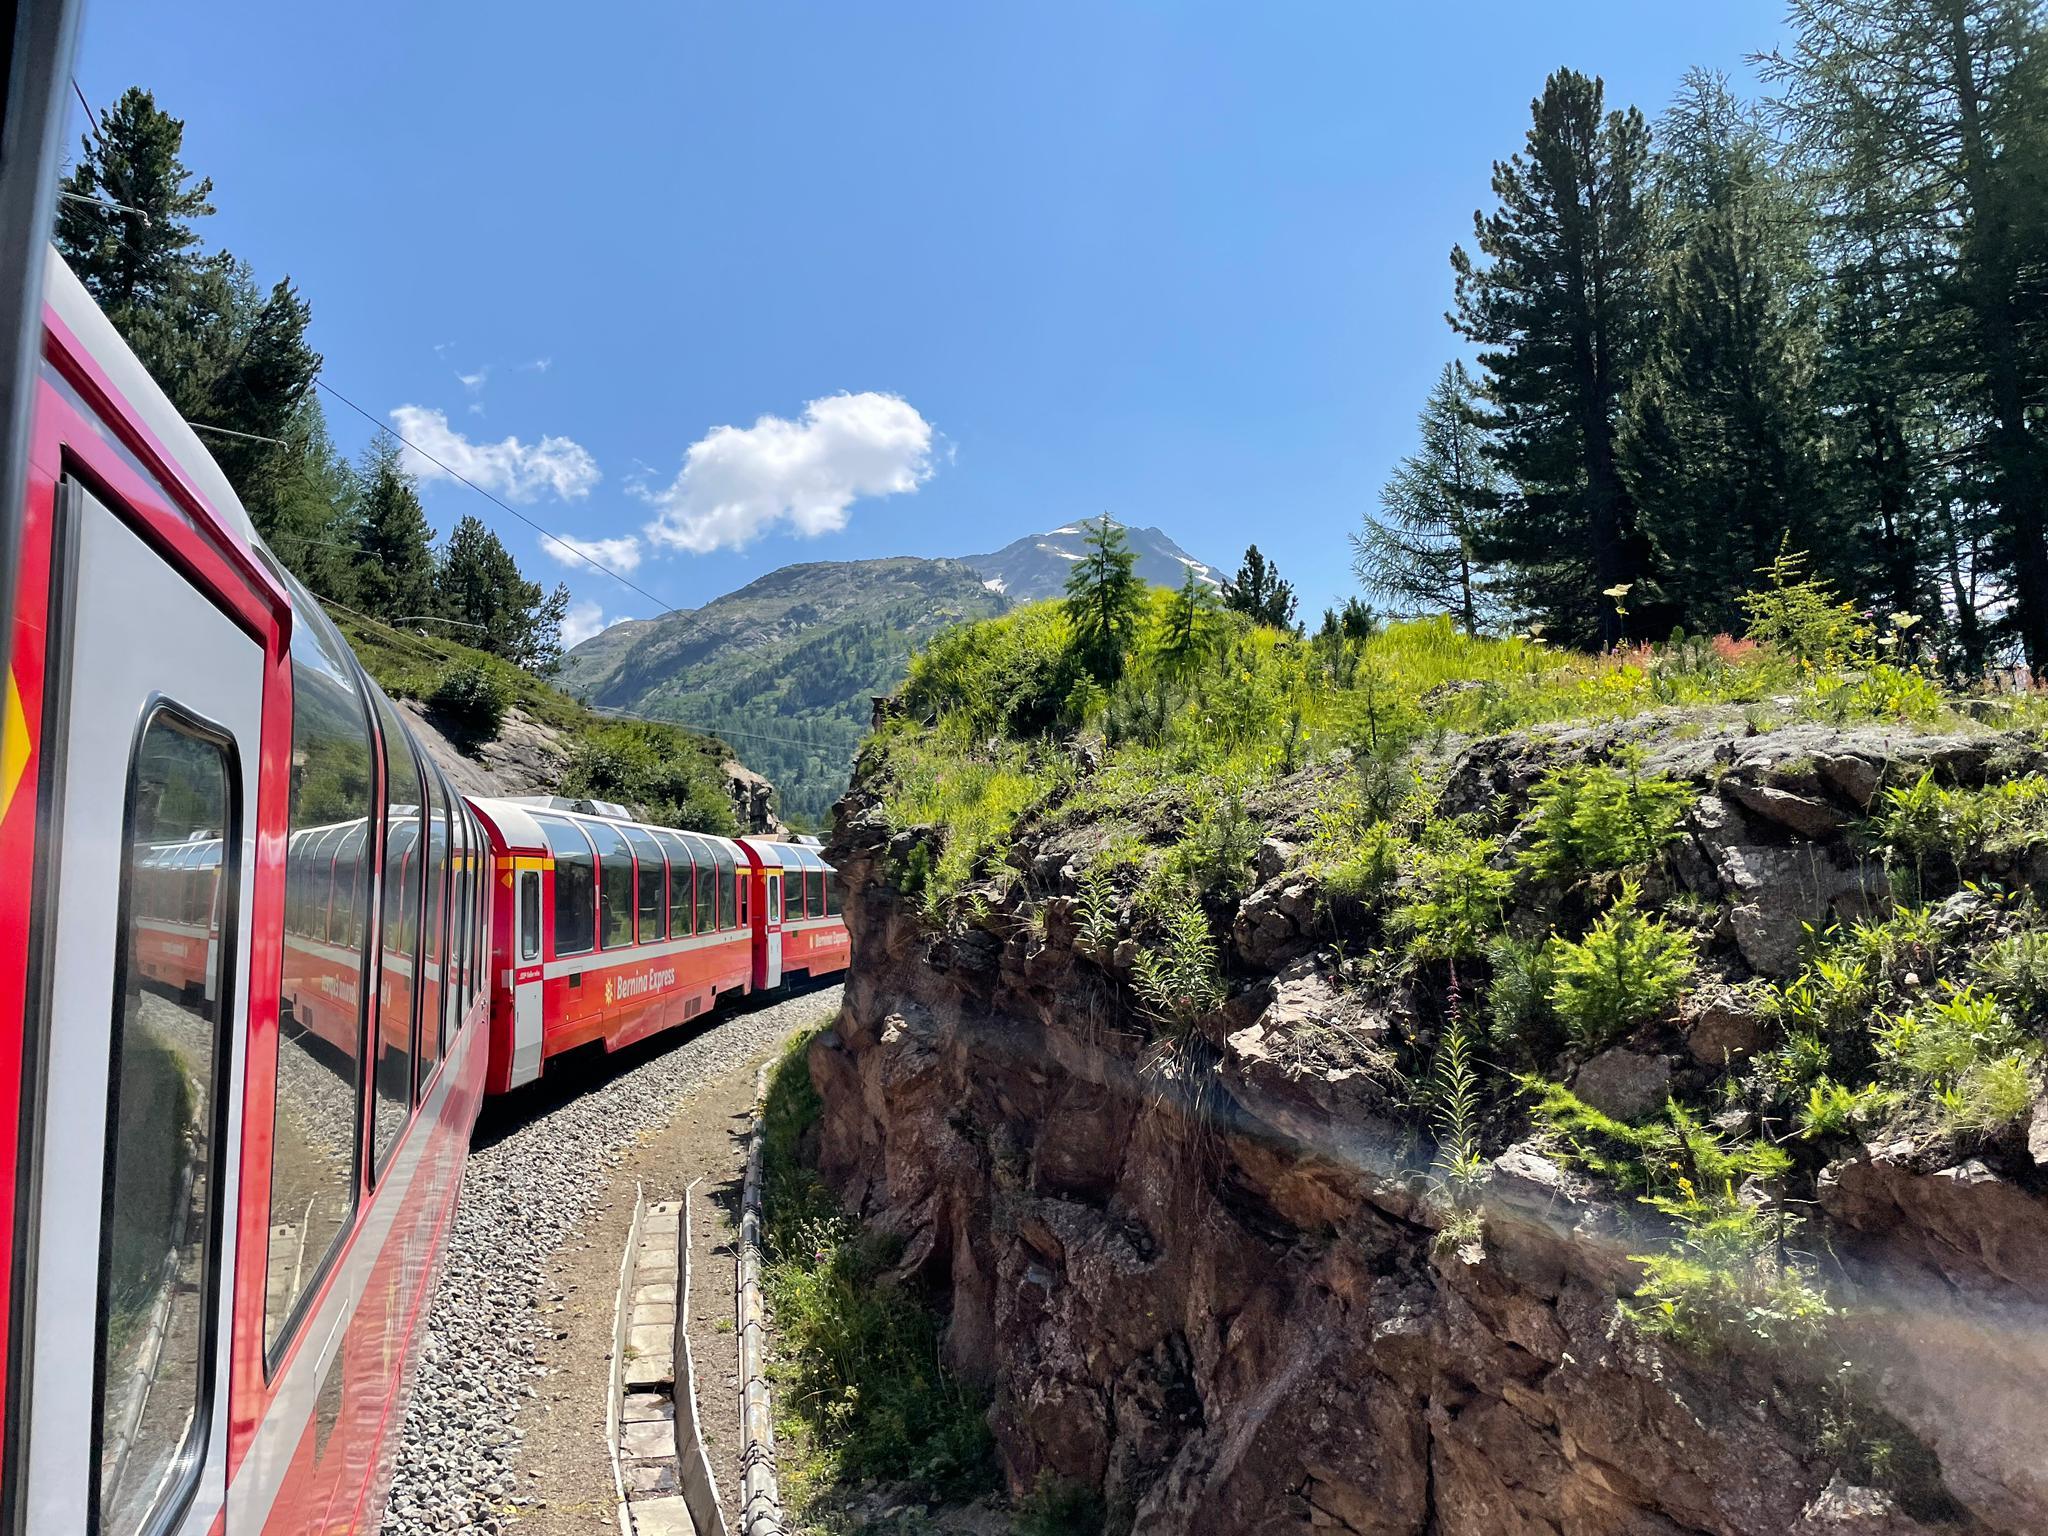 Voyage de la famille Cavadini: le Bernina Express